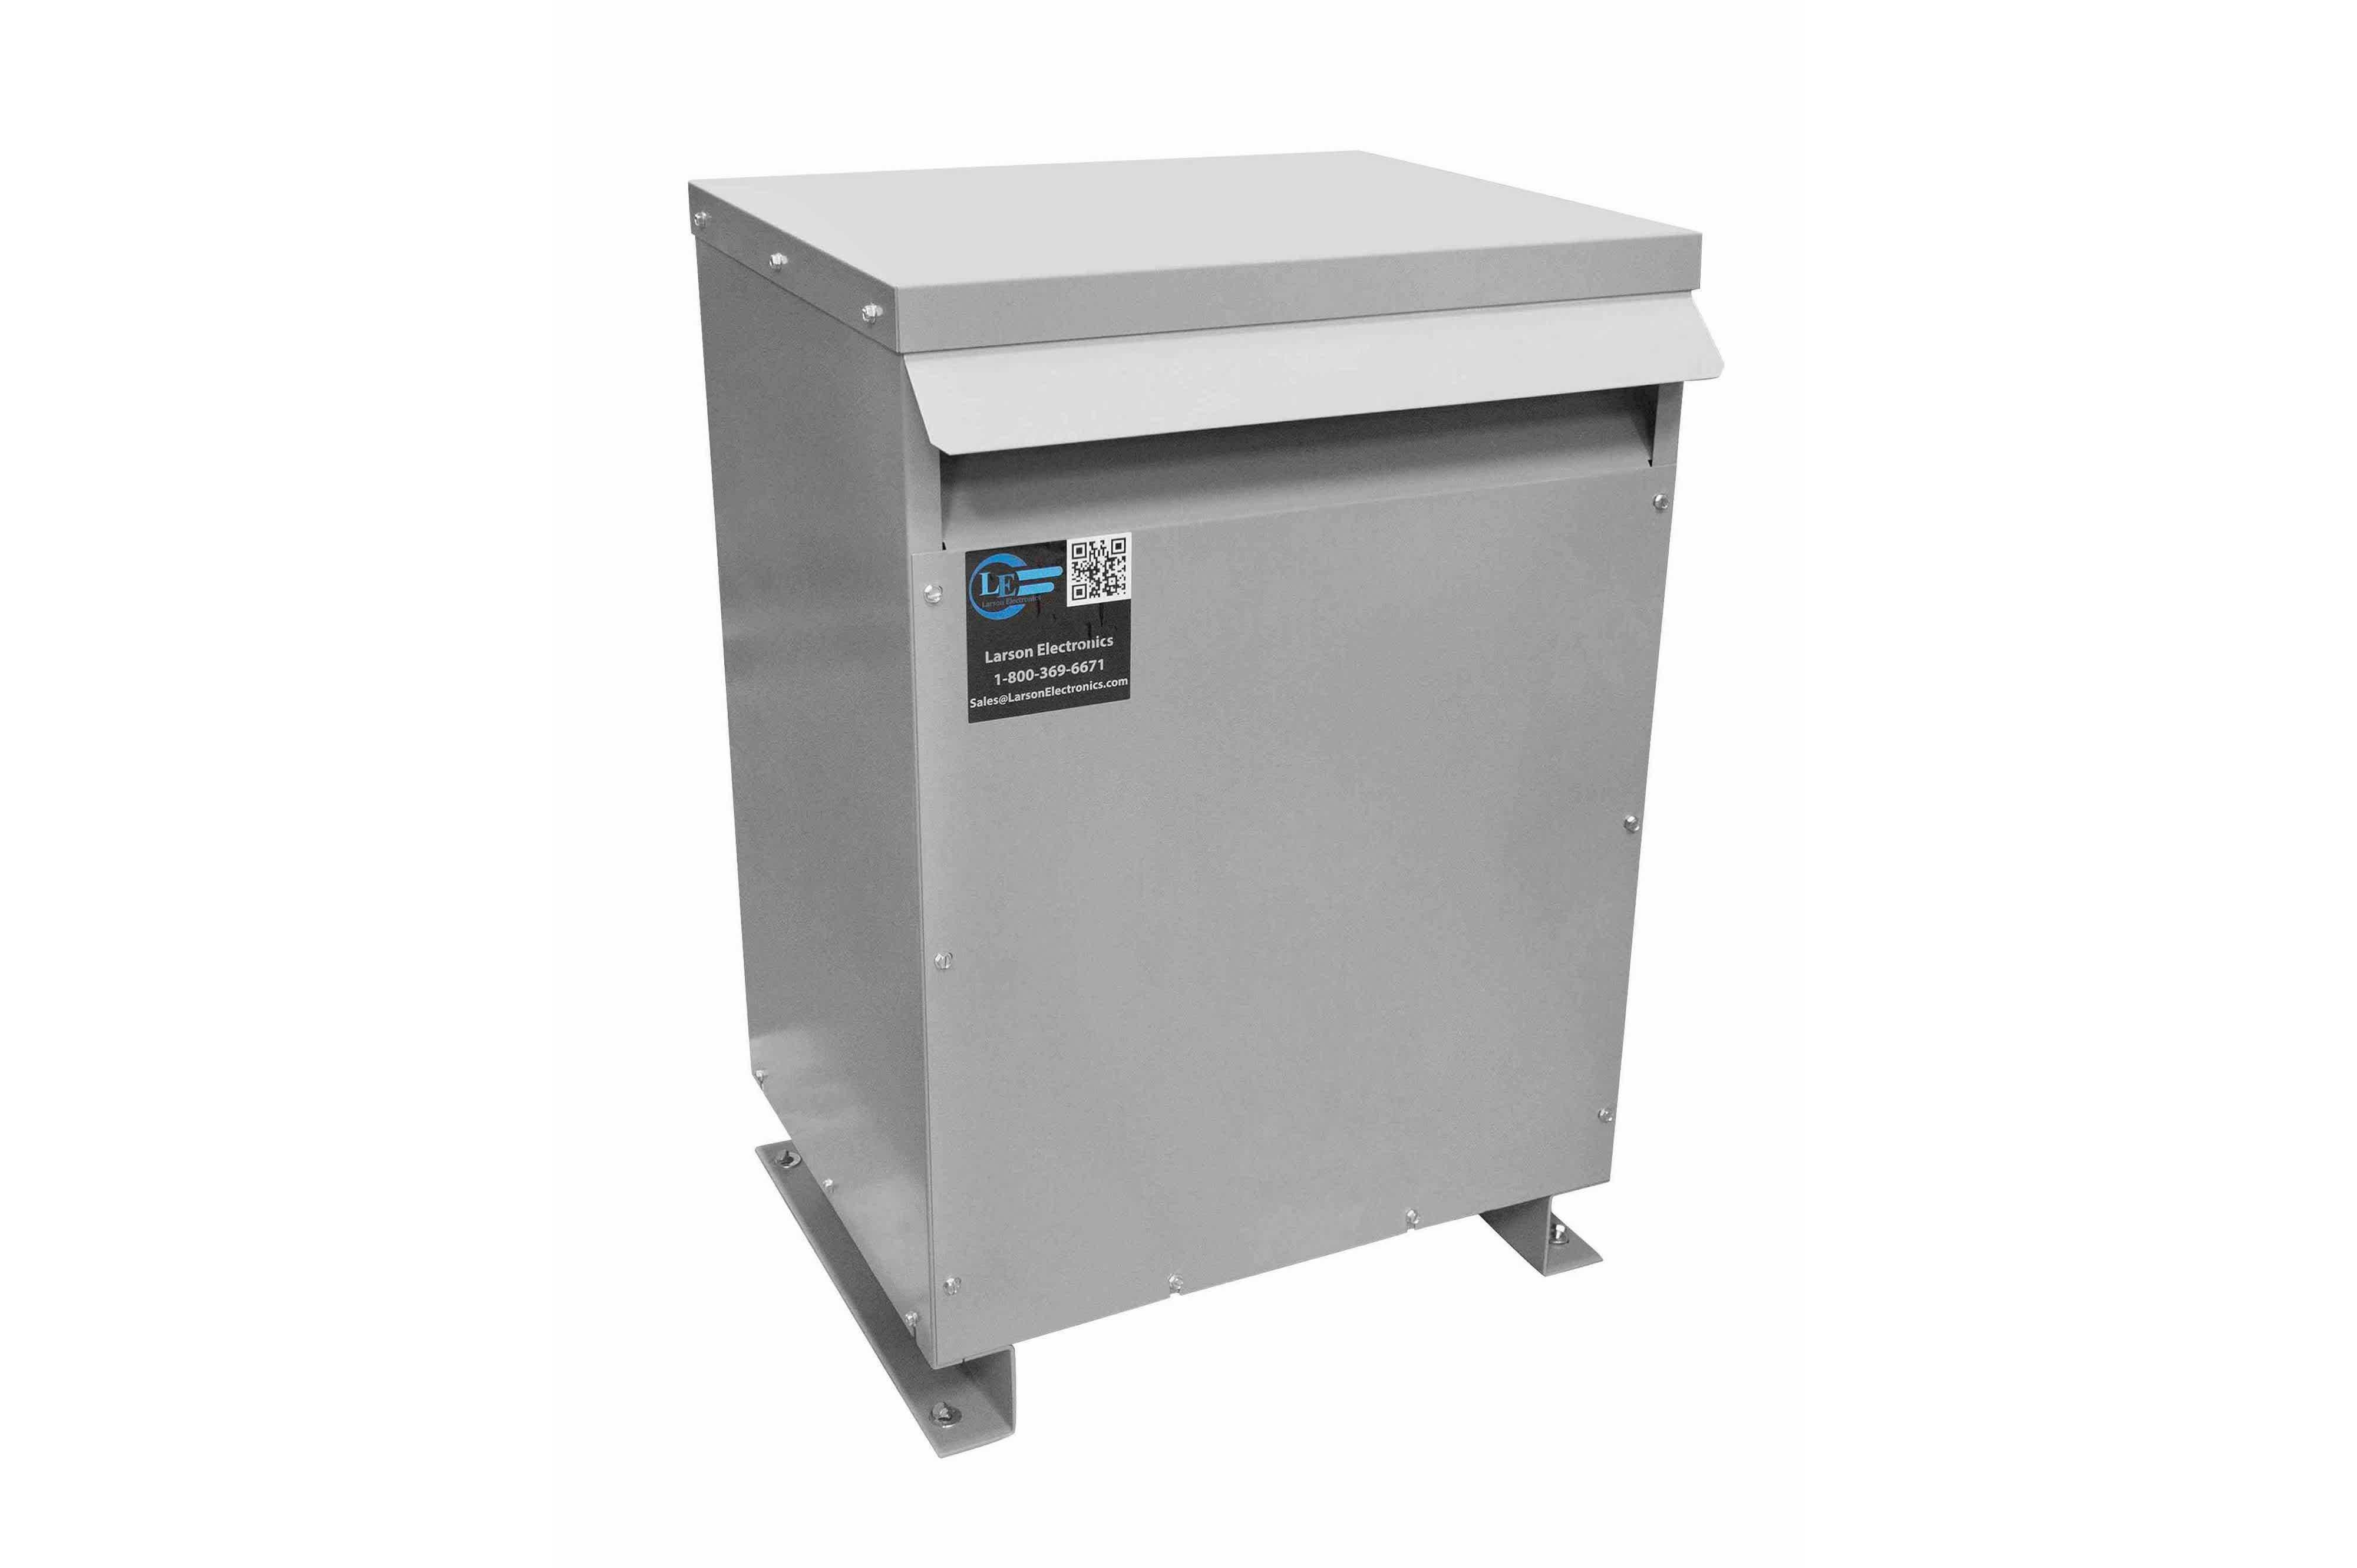 125 kVA 3PH Isolation Transformer, 480V Wye Primary, 380V Delta Secondary, N3R, Ventilated, 60 Hz